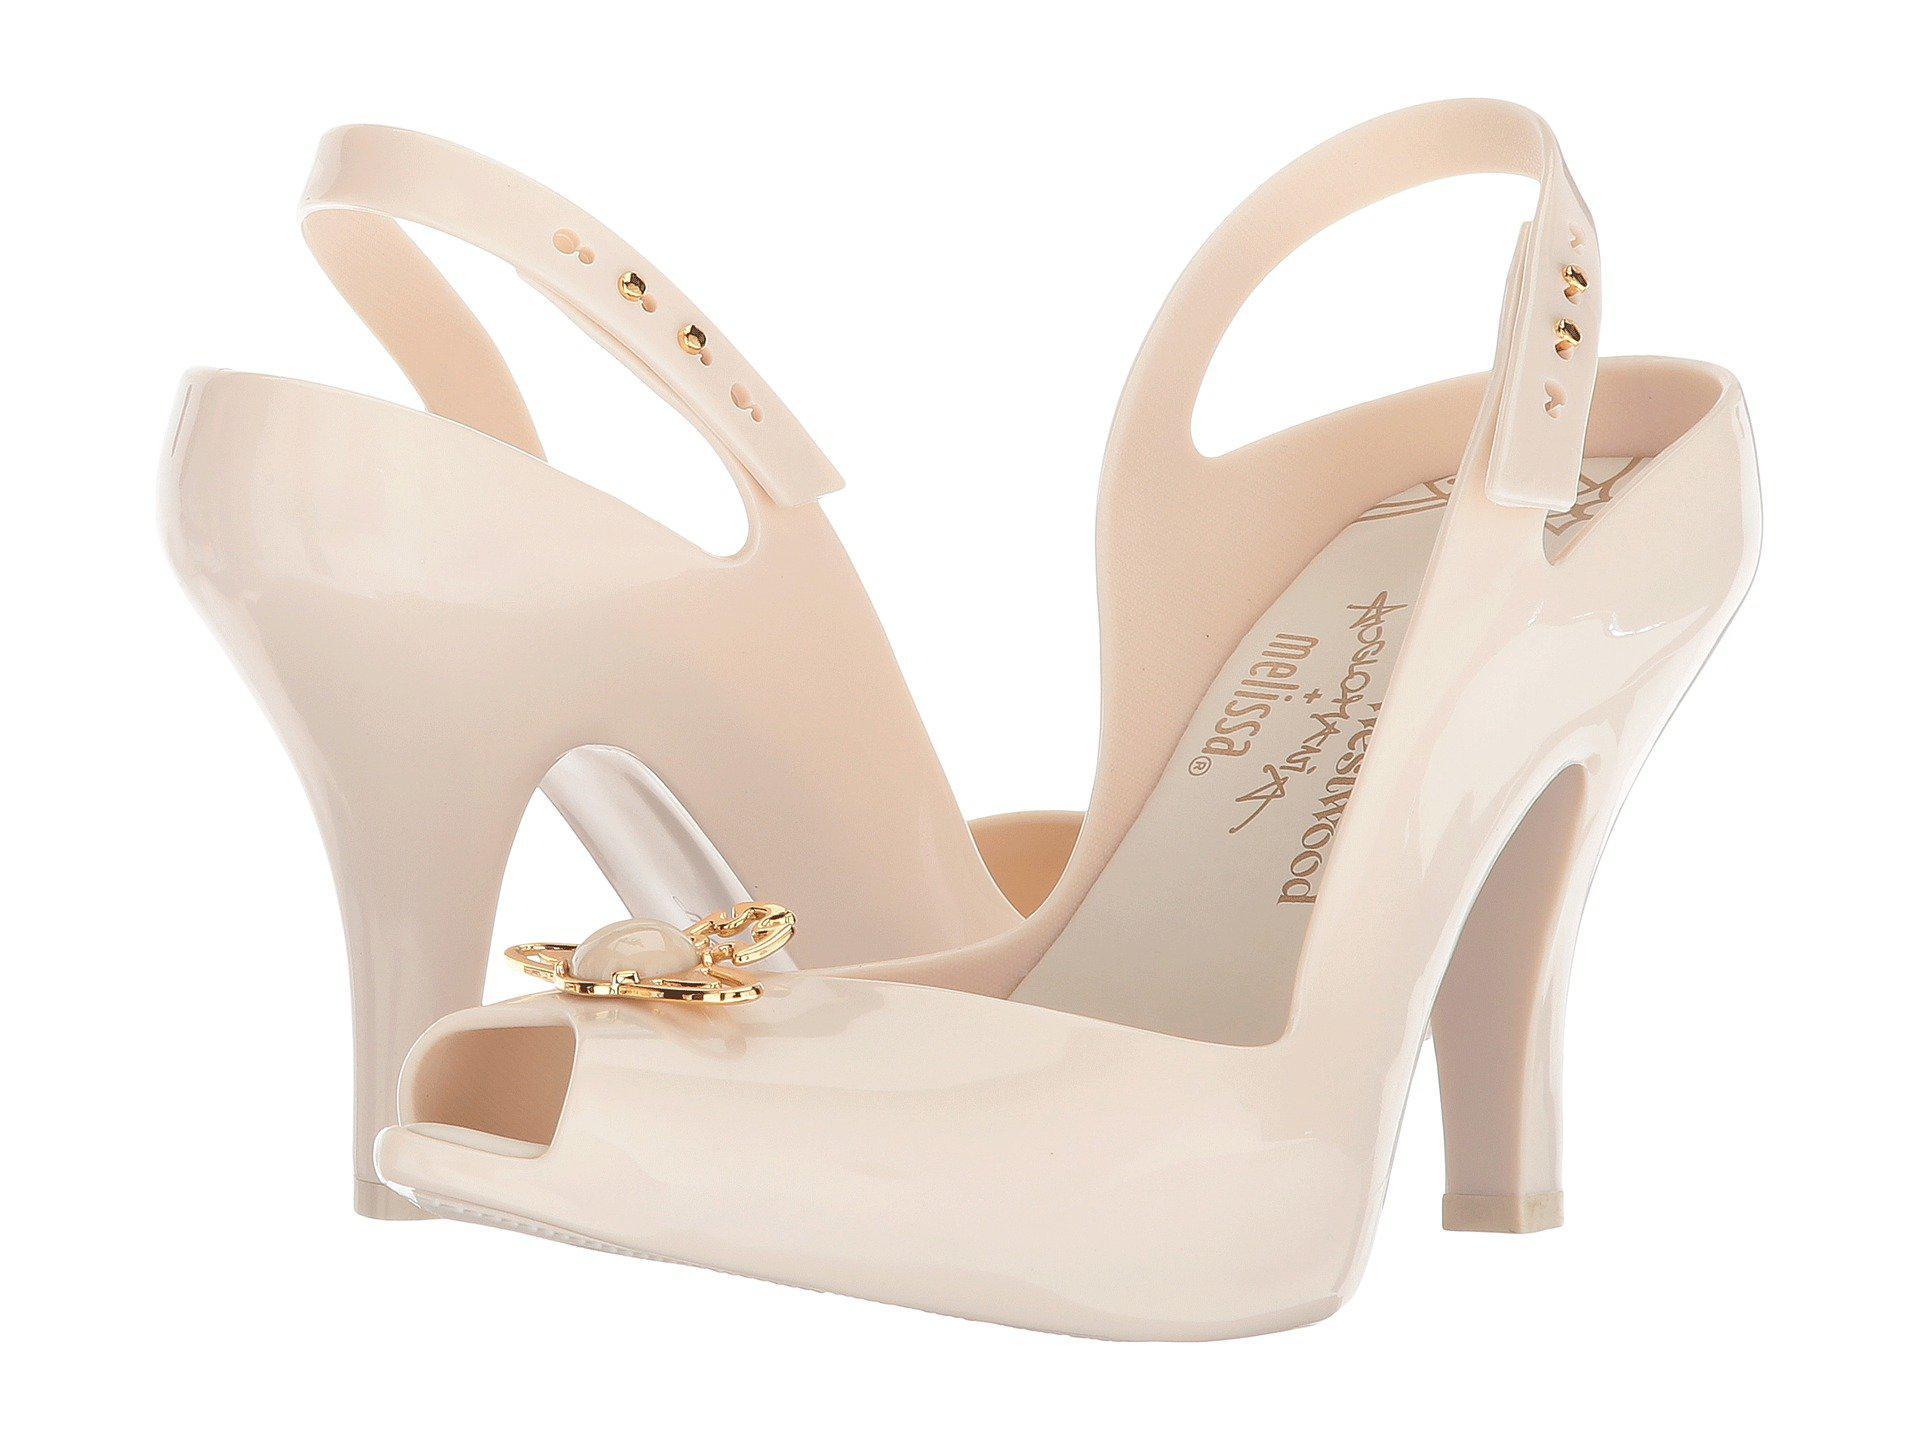 Melissa Shoes VWA + Lady Dragon XIV tGr1OKBe6c